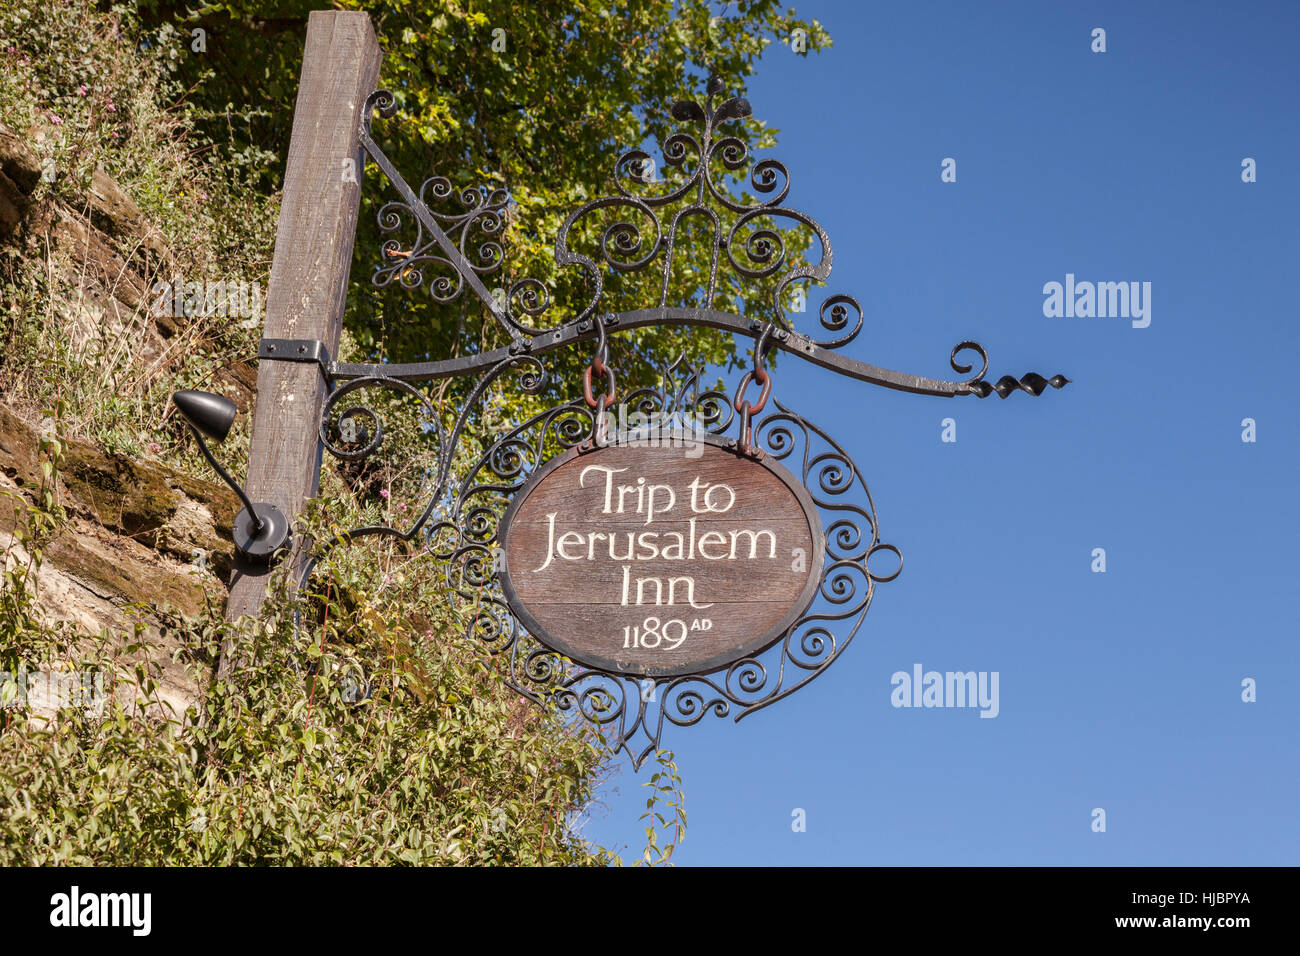 Pub sign, viaje a Jerusalén Inn, 1189AD, la hostería más antigua de Inglaterra, Nottingham, Inglaterra, Imagen De Stock